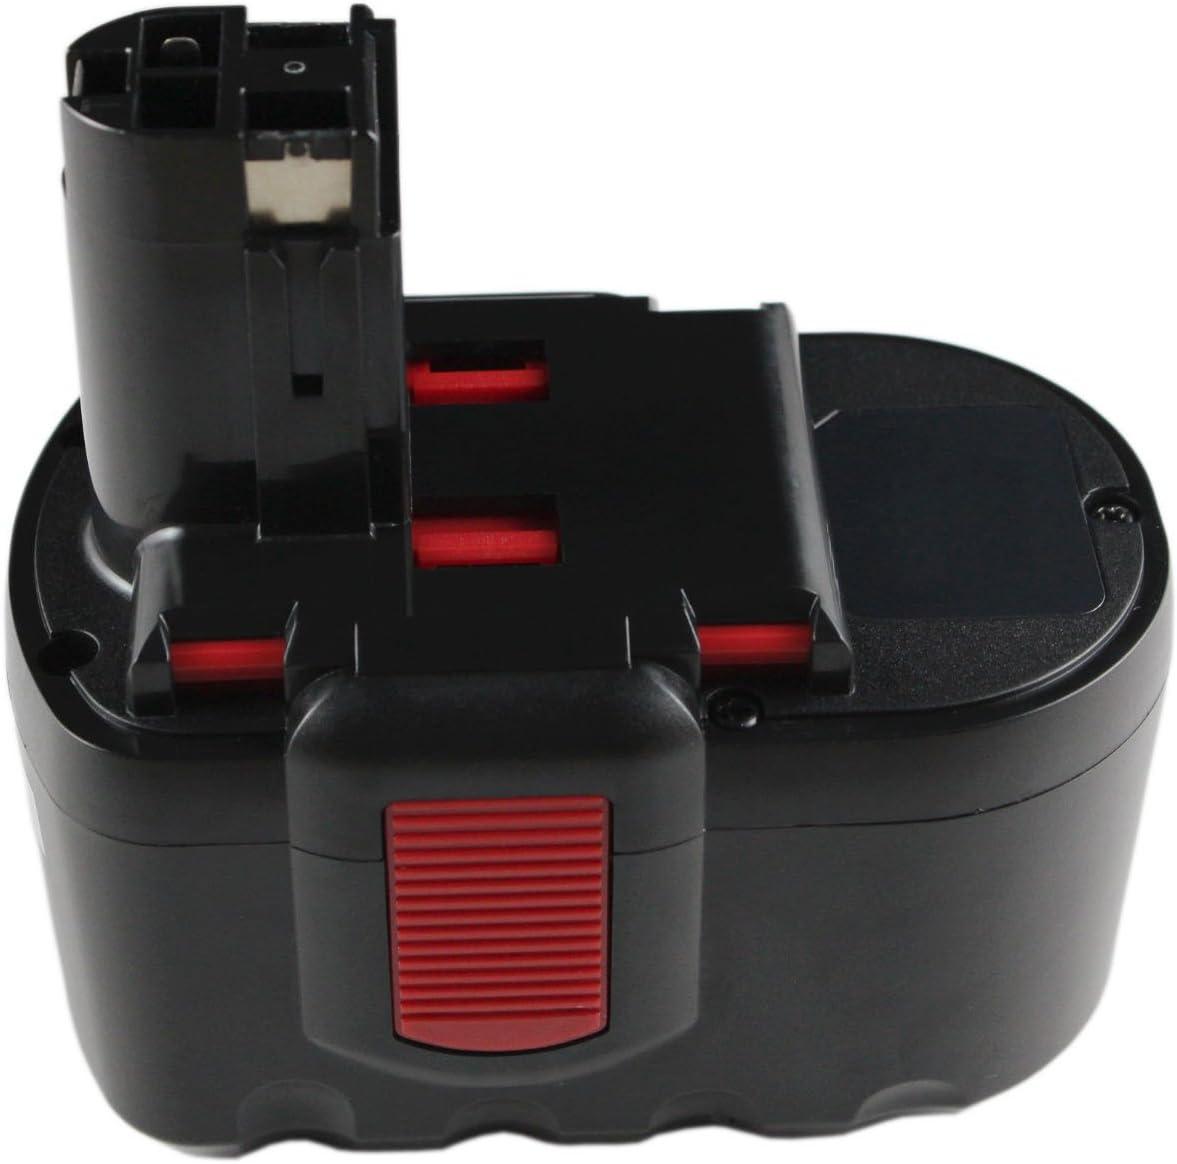 Golden Dragon - Batería para taladro Bosch PSB 24VE-2, BTP1005, GMC 24V, GBH24VF (24,00 V, 2000 mAh, Ni-Cd)